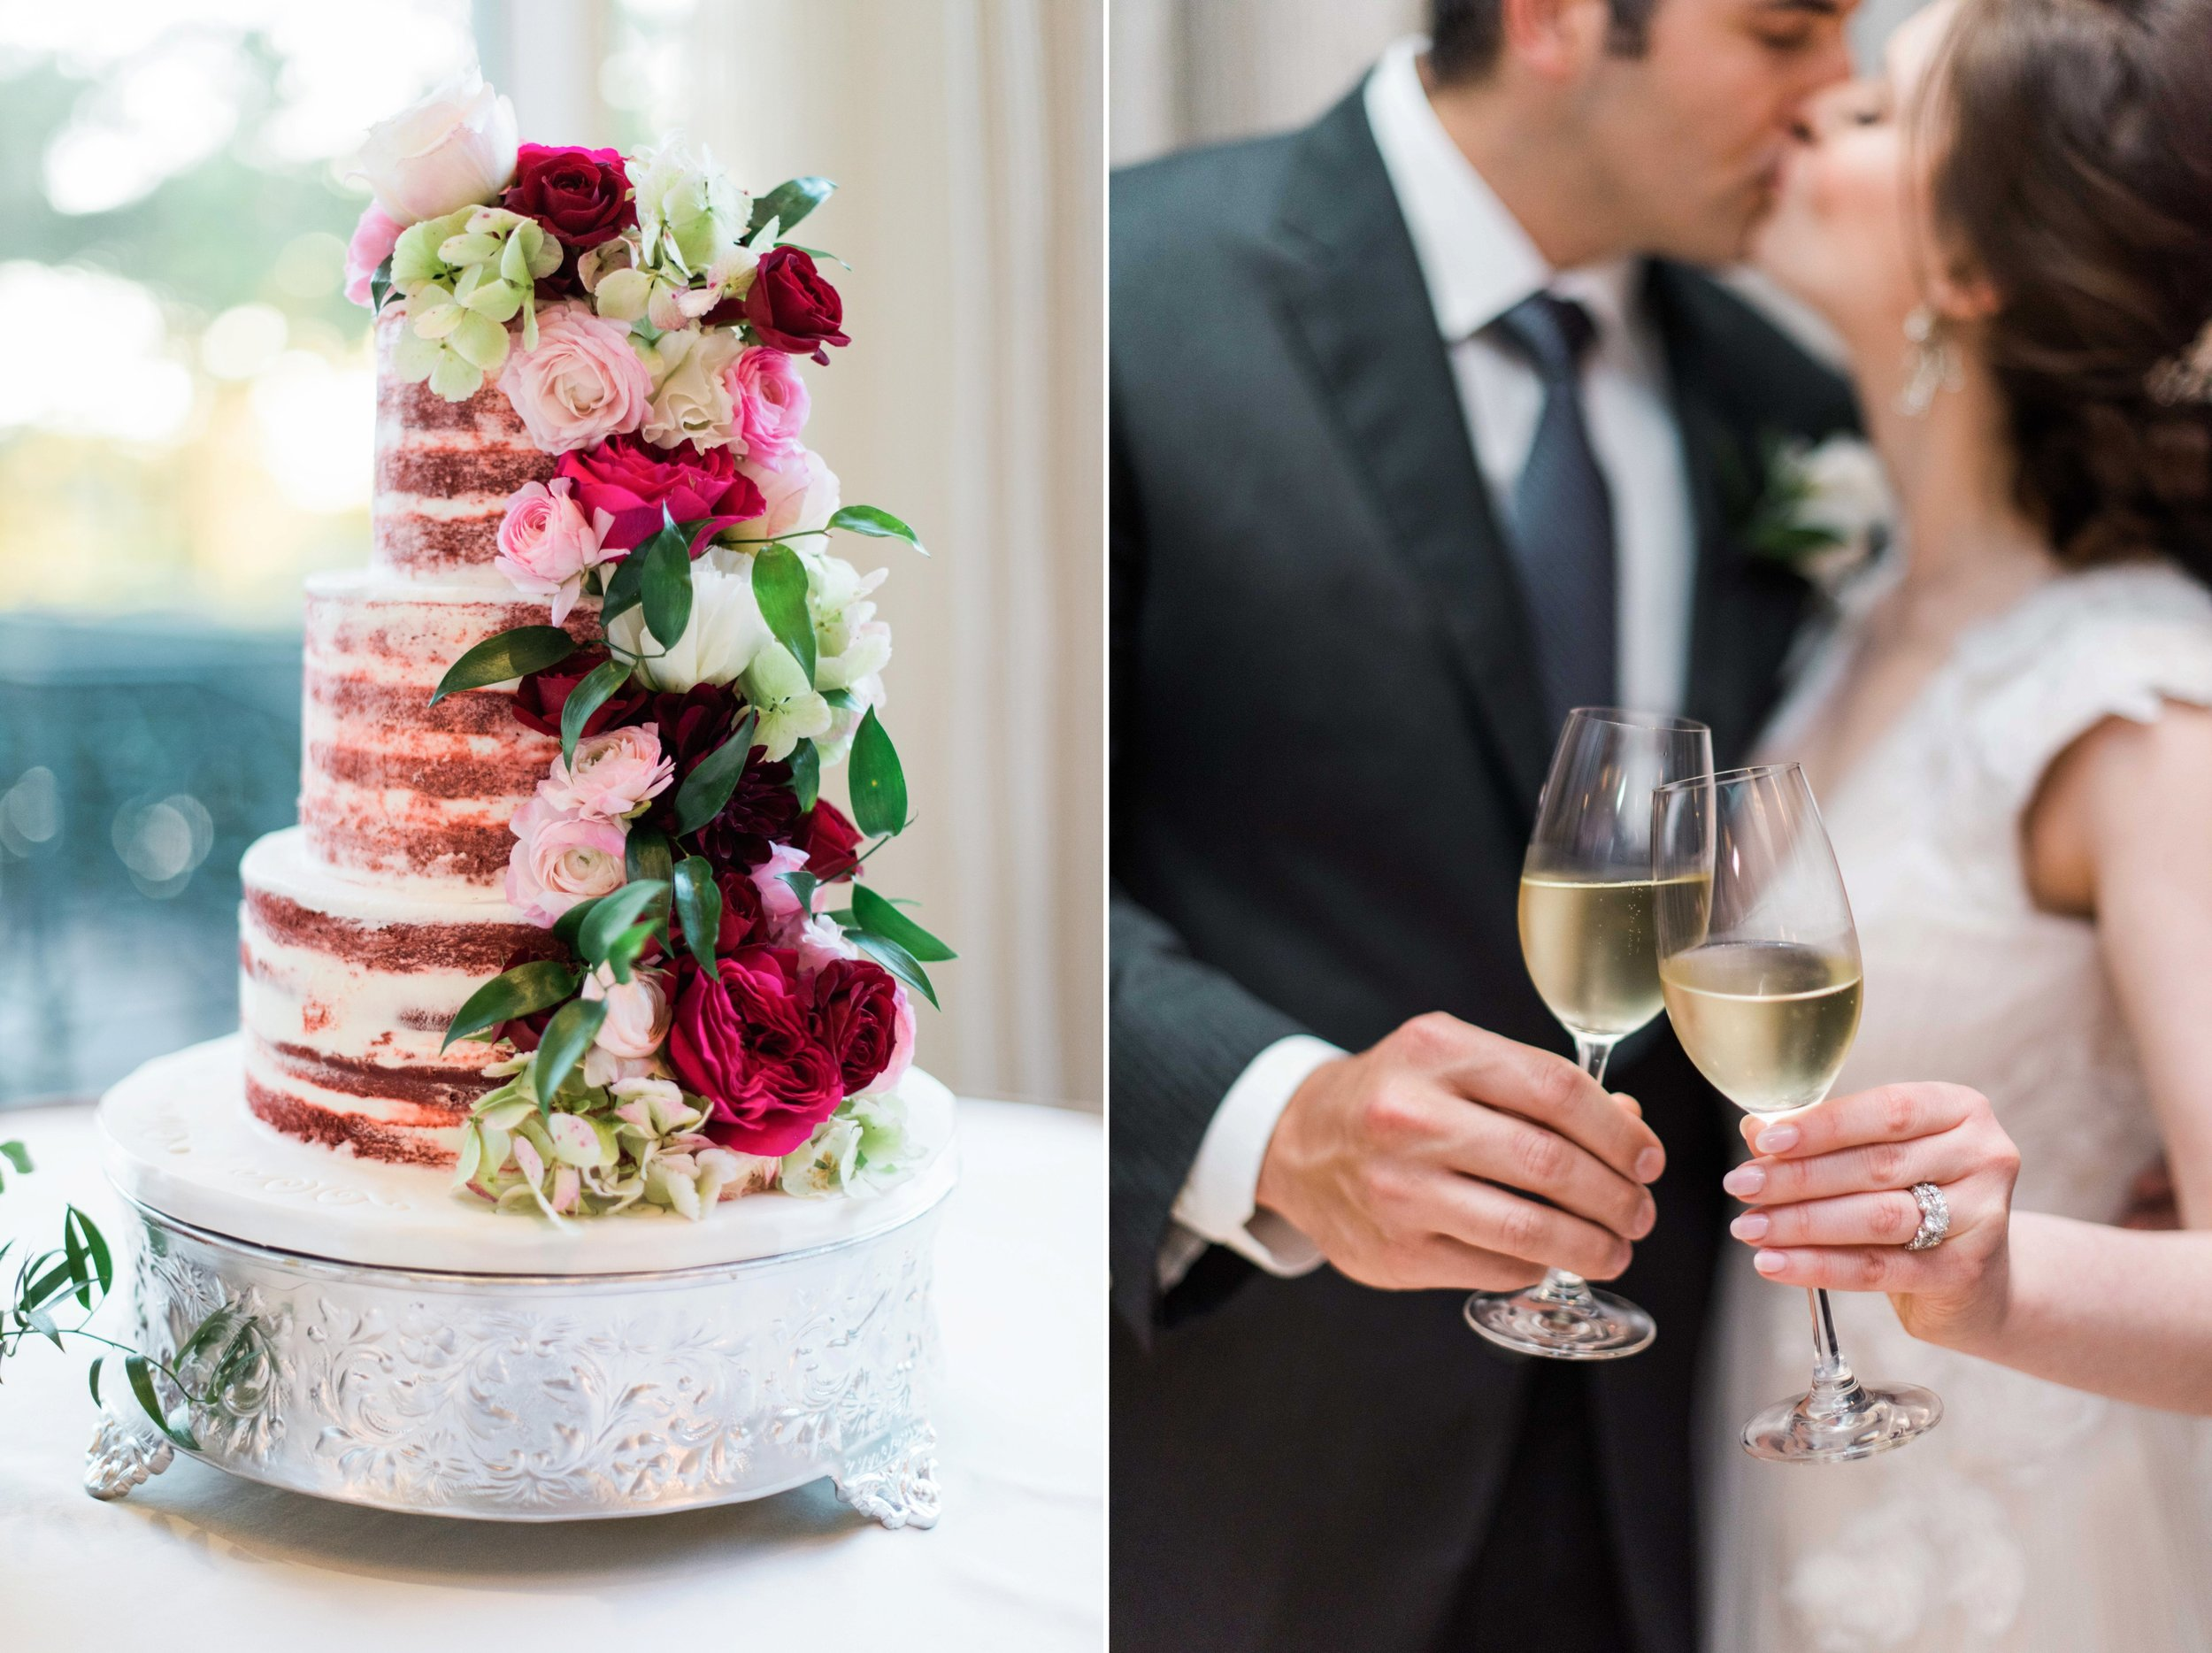 Houston-Wedding-Photographer-Lakeside-Country-Club-First-Look-Bride-Groom-Formals-Film-Fine-Art-Photography-202.jpg